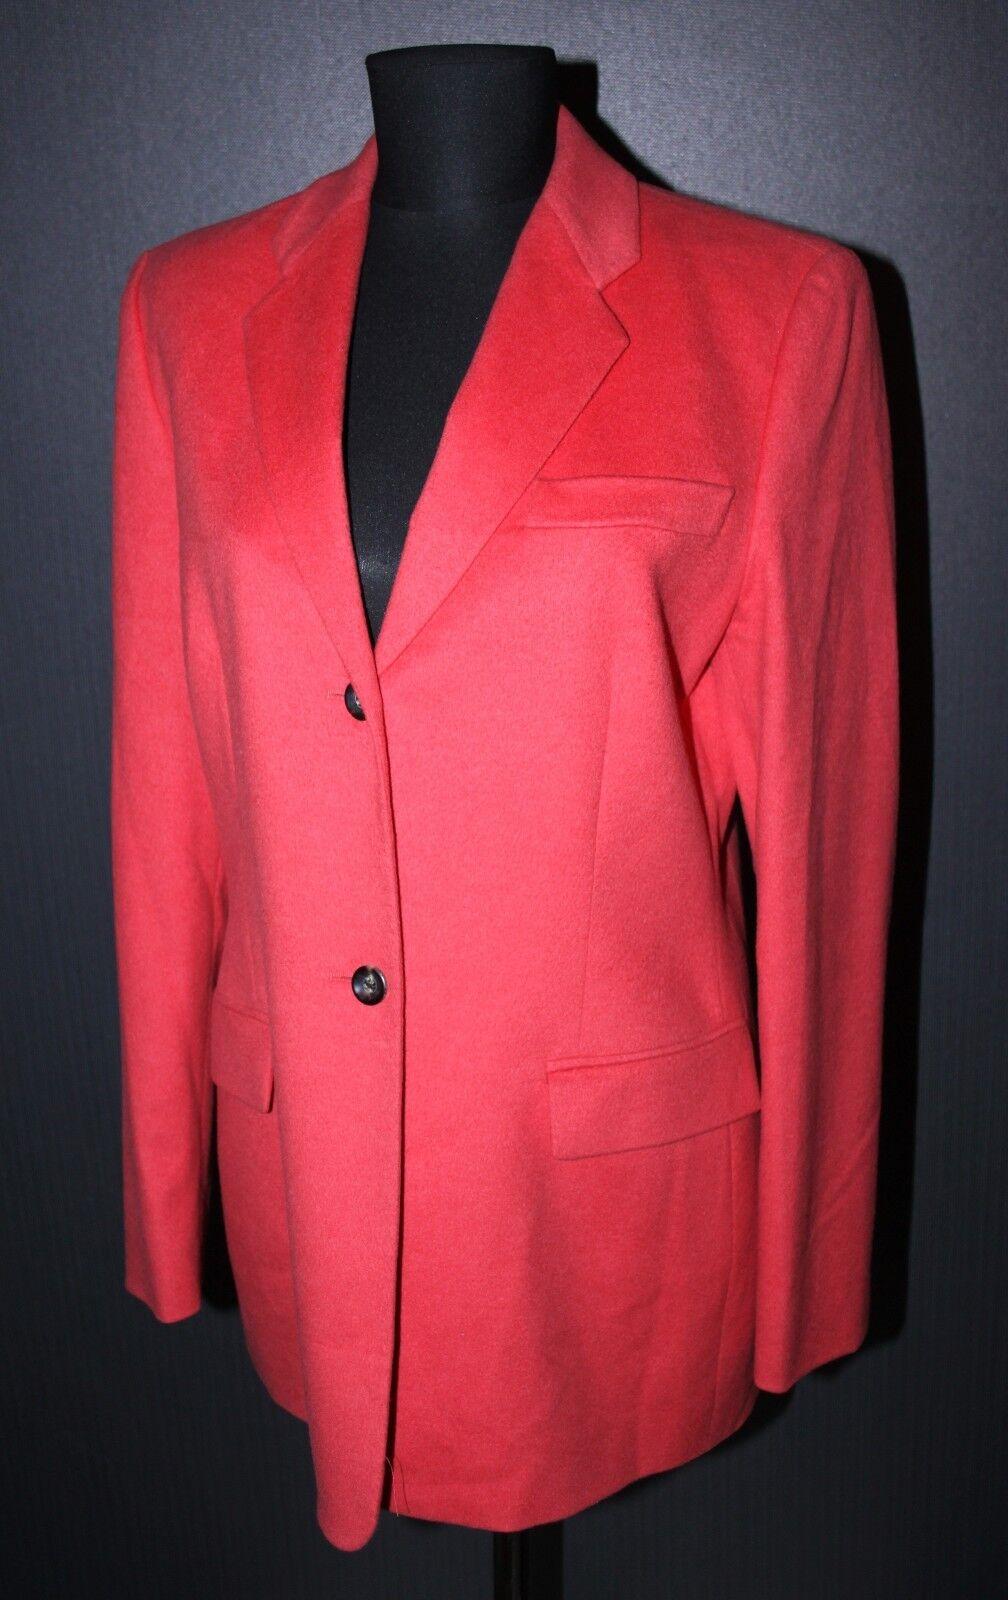 Cerruti 1881 womens blazer Size D 40 wool cashmere